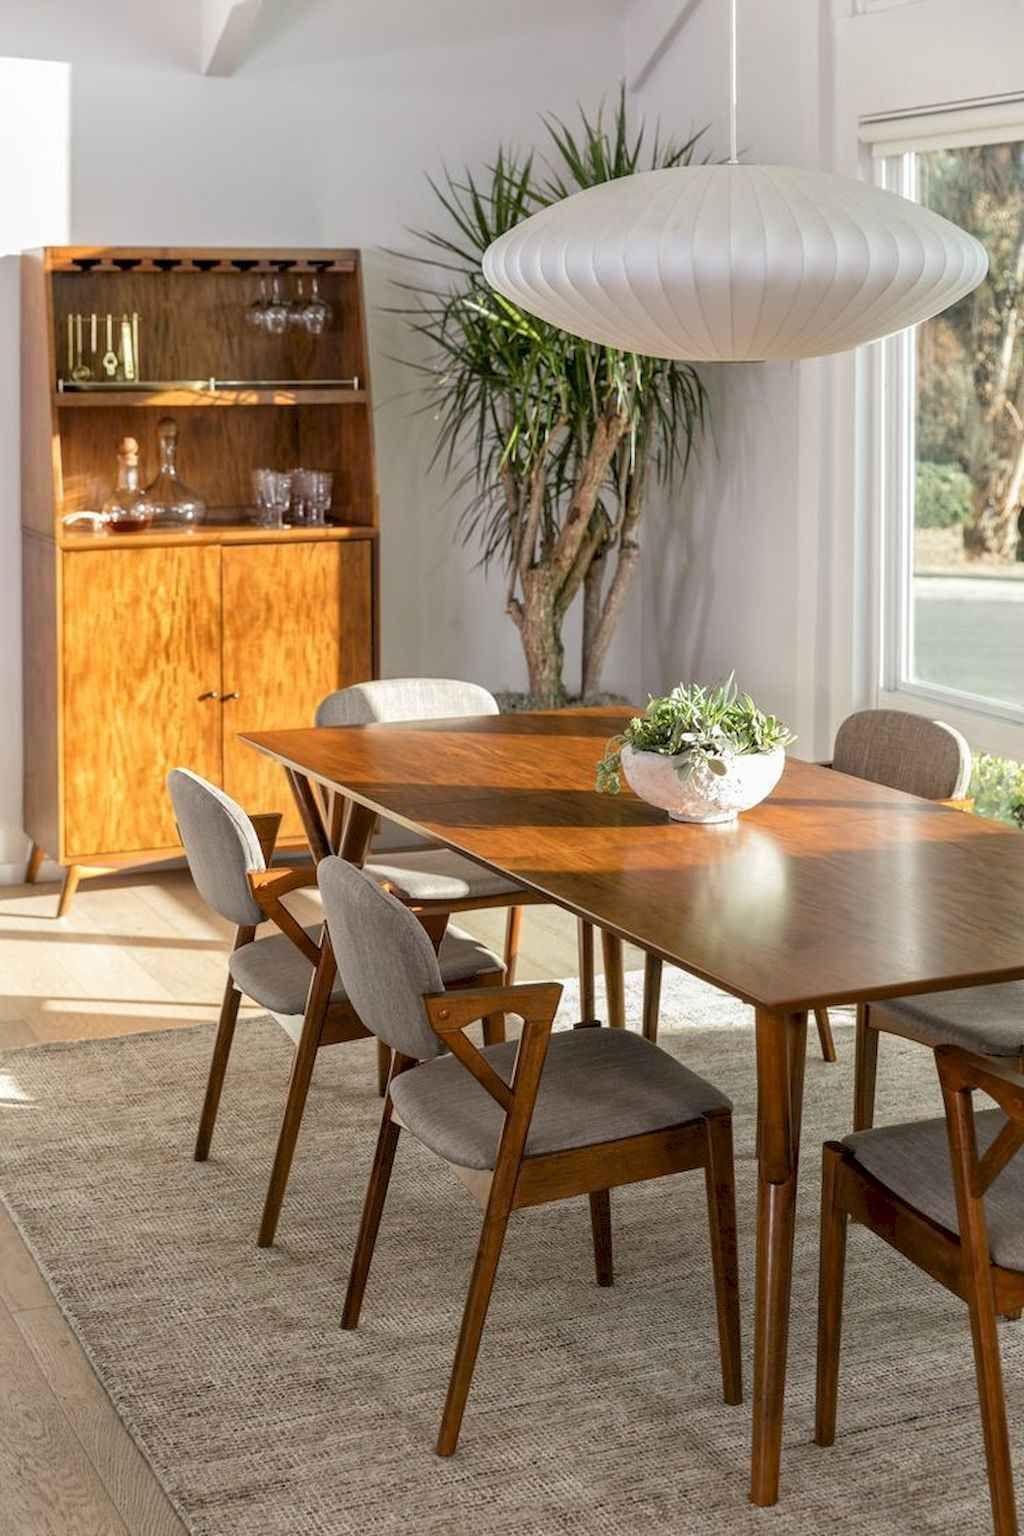 70 Moderne Ideeen Uit De Mid Century Eetkamertafel Gladecor Com In 2020 Mid Century Dining Room Modern Dining Table Mid Century Modern Dining Room